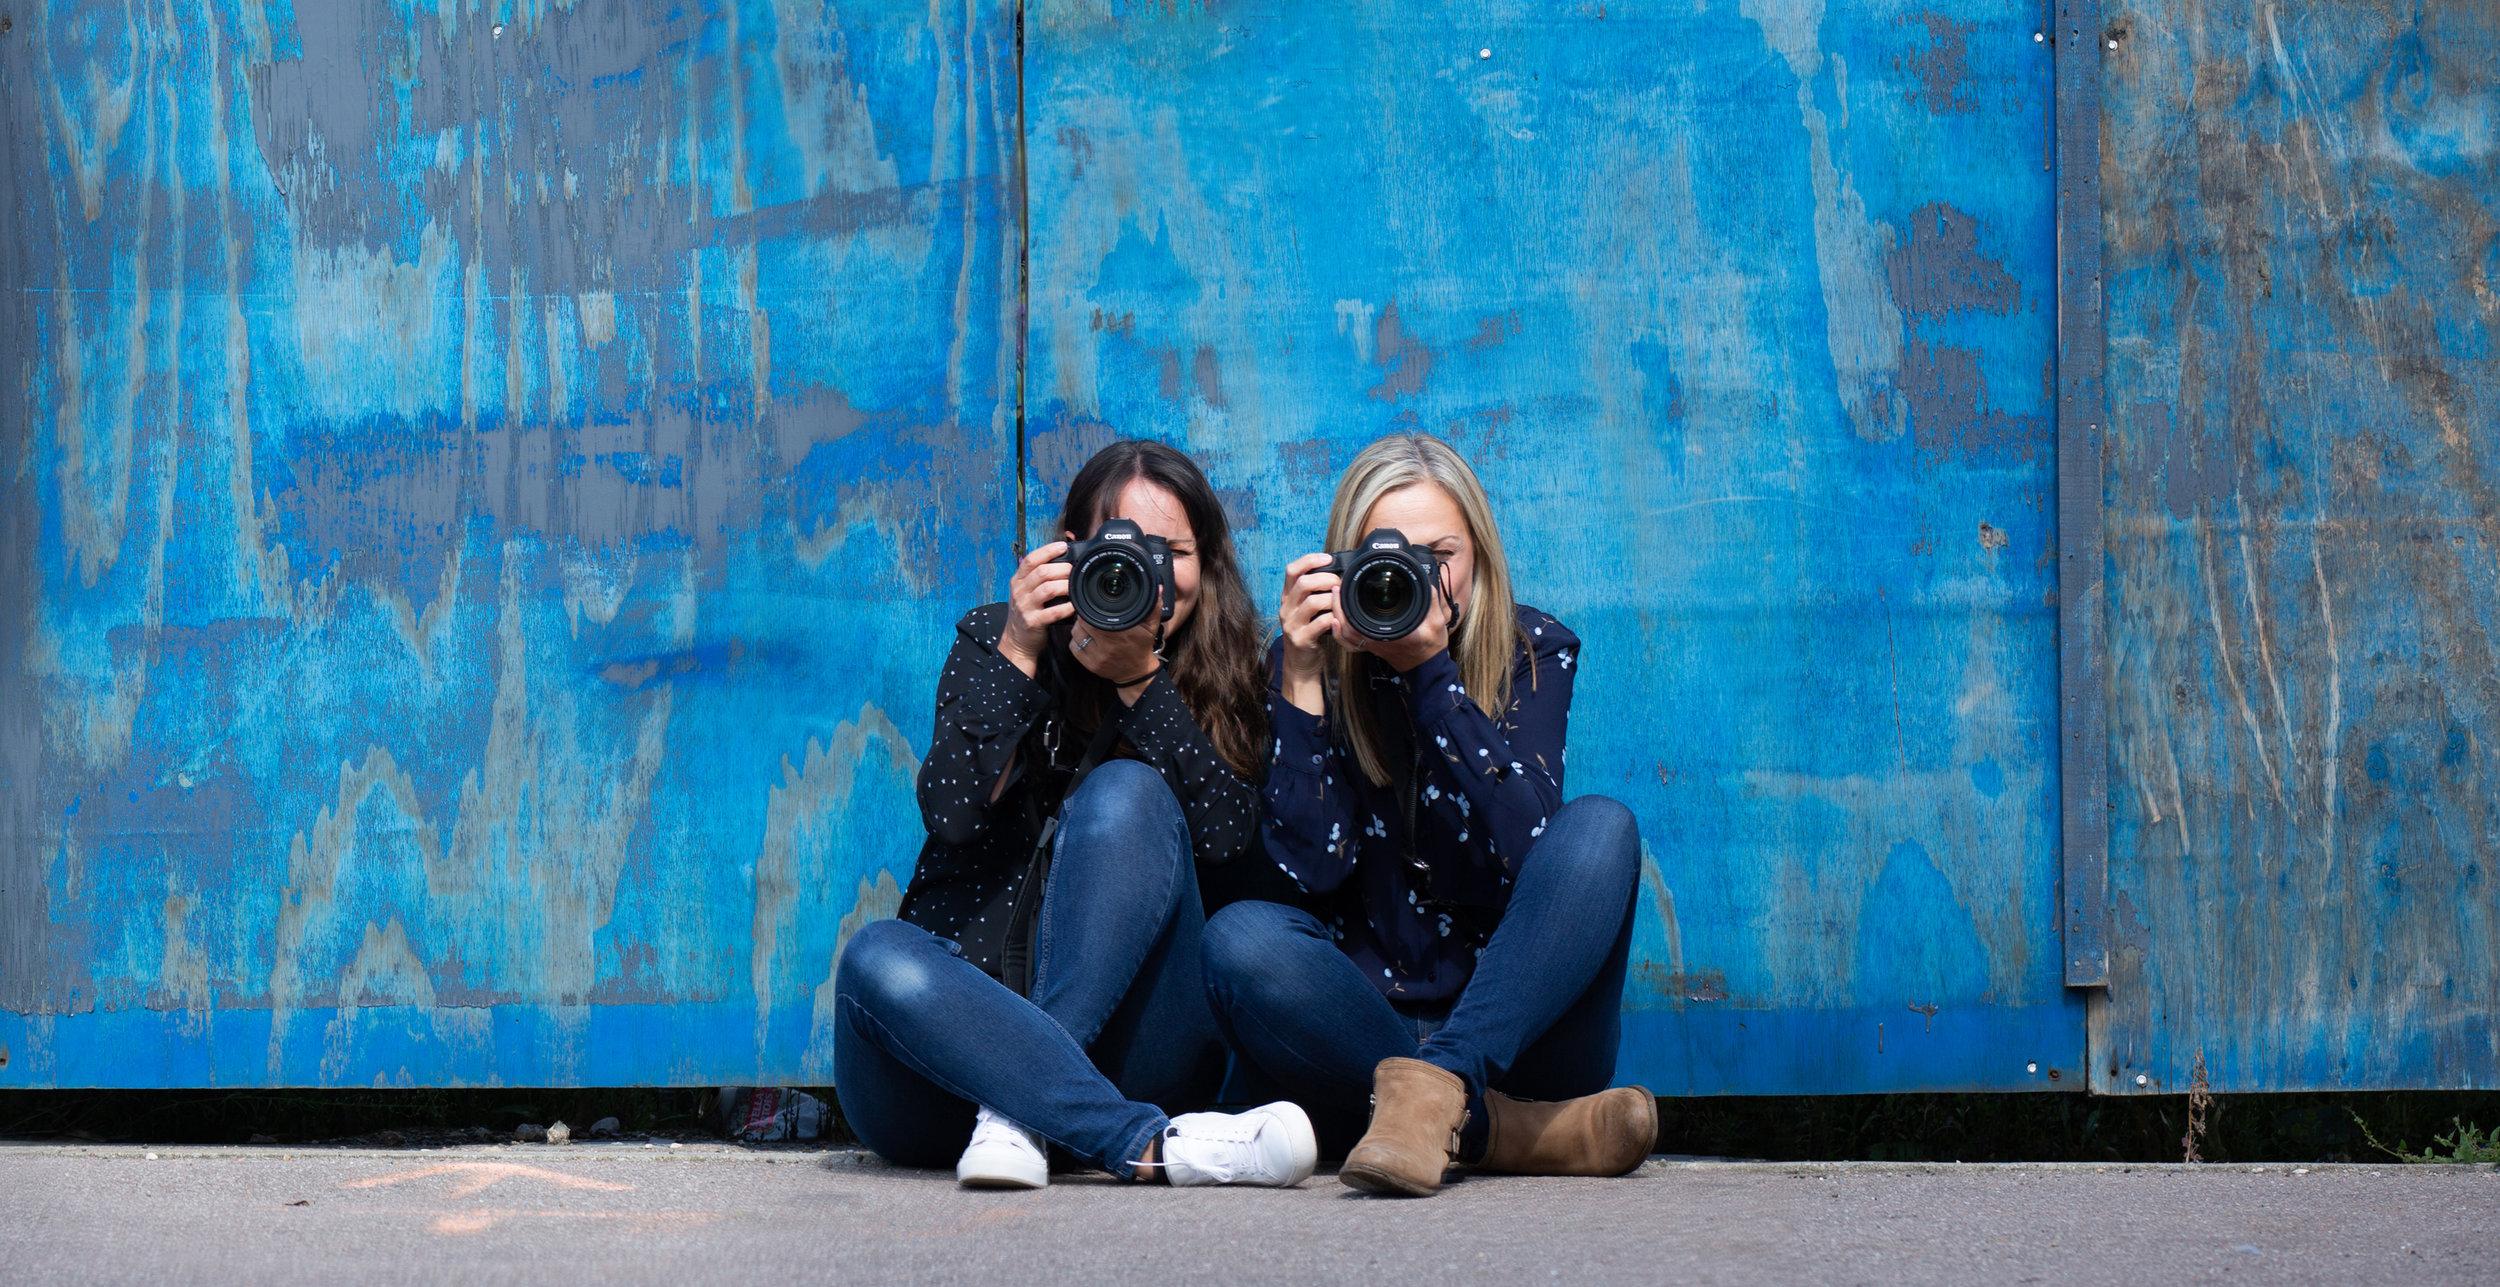 herts photography.jpg